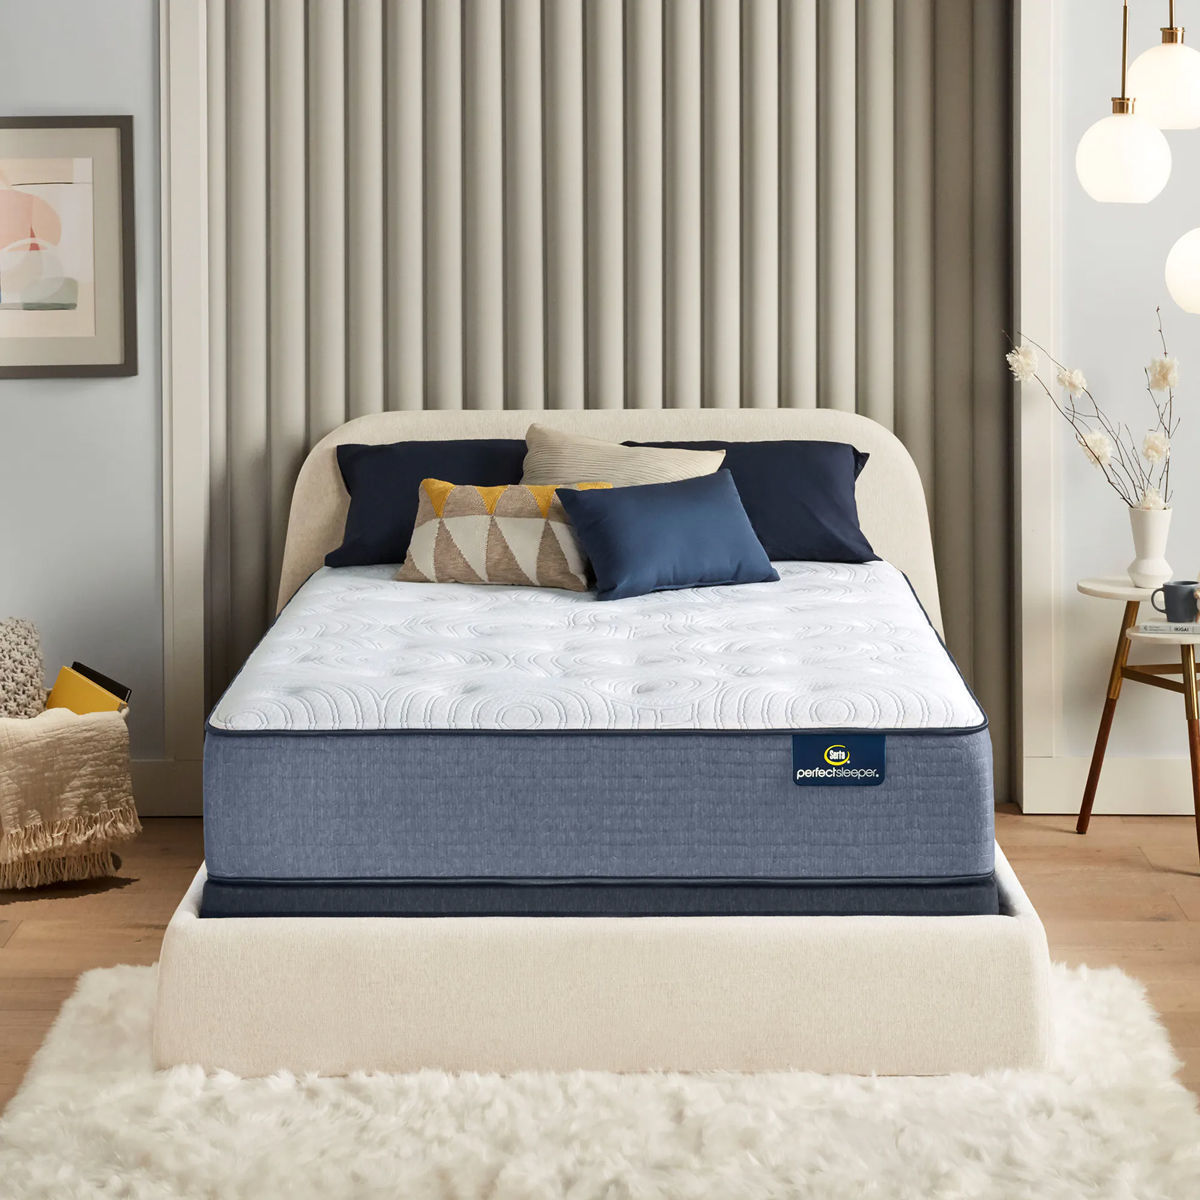 Picture of Serta Renewed Sleep Medium Comfort Mattress